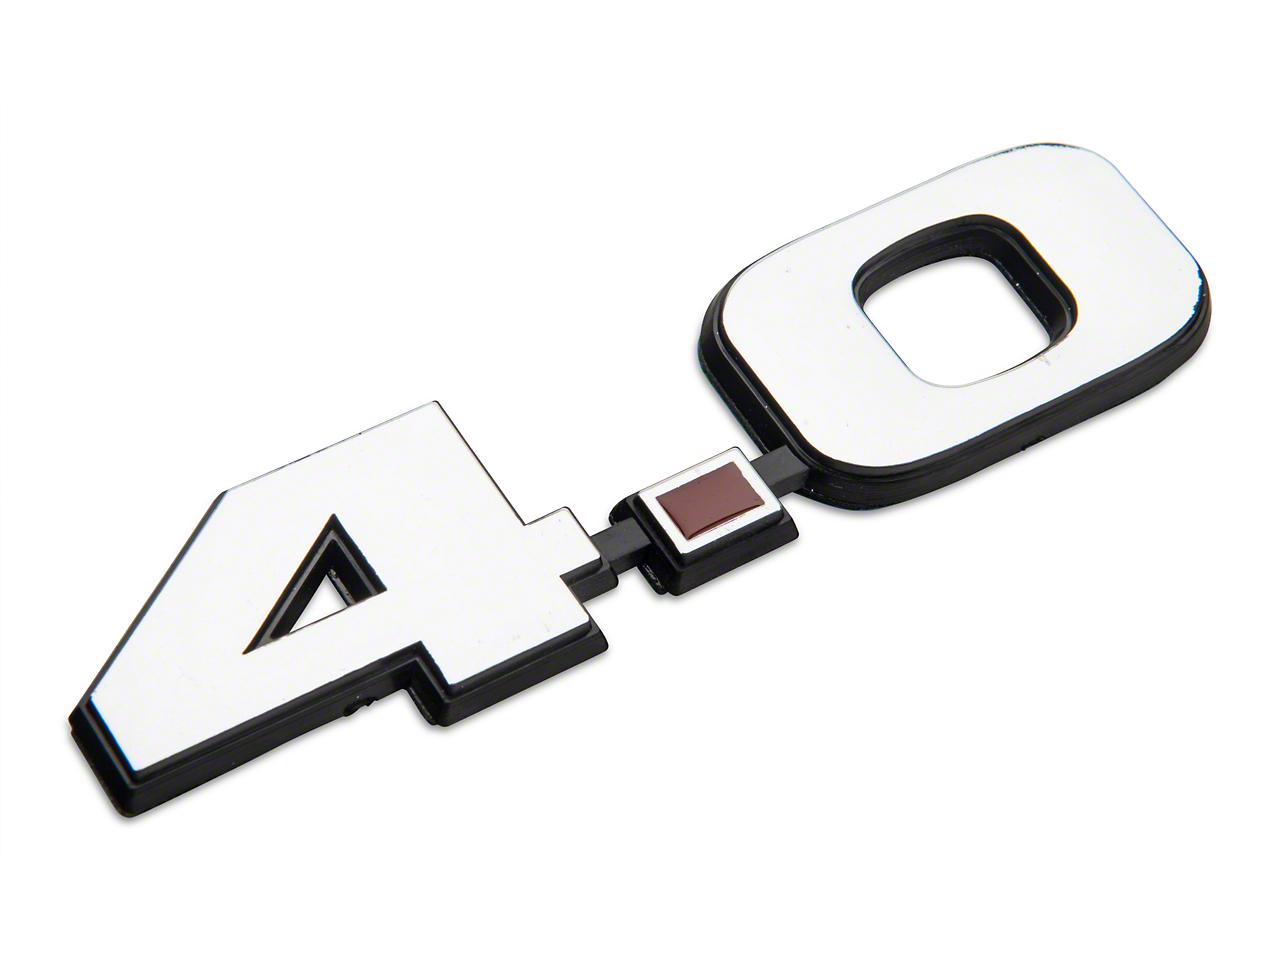 SpeedForm Chrome 4.0L V6 Fender Emblem (05-10 V6)